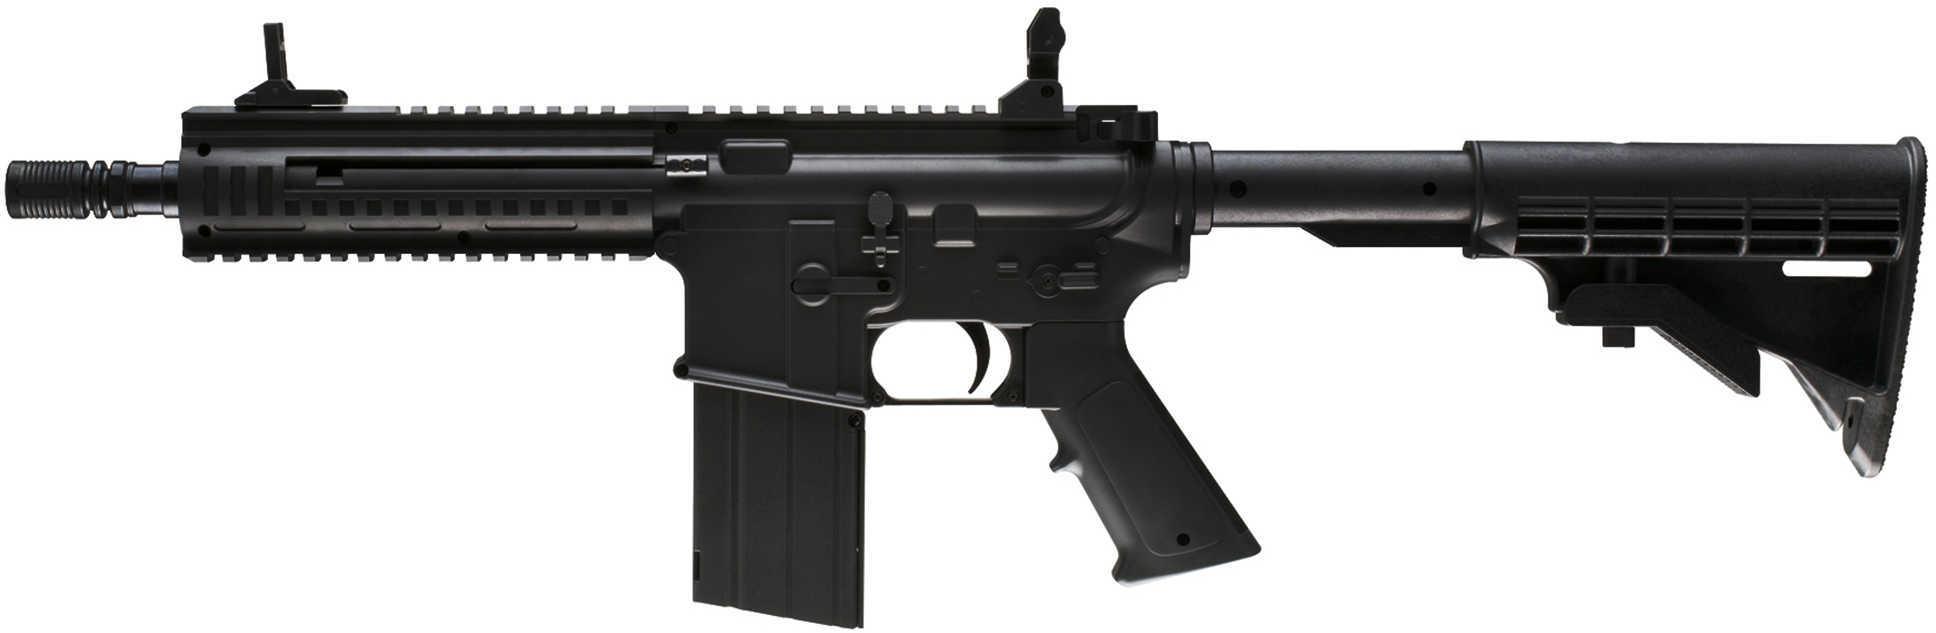 Umarex USA SteelForce .177 BB Airgun Md: 2254855